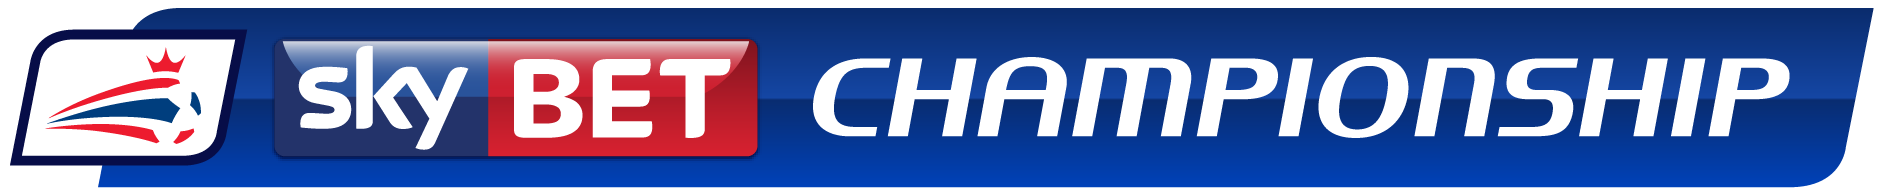 Sky_Bet_Championship_logo.png